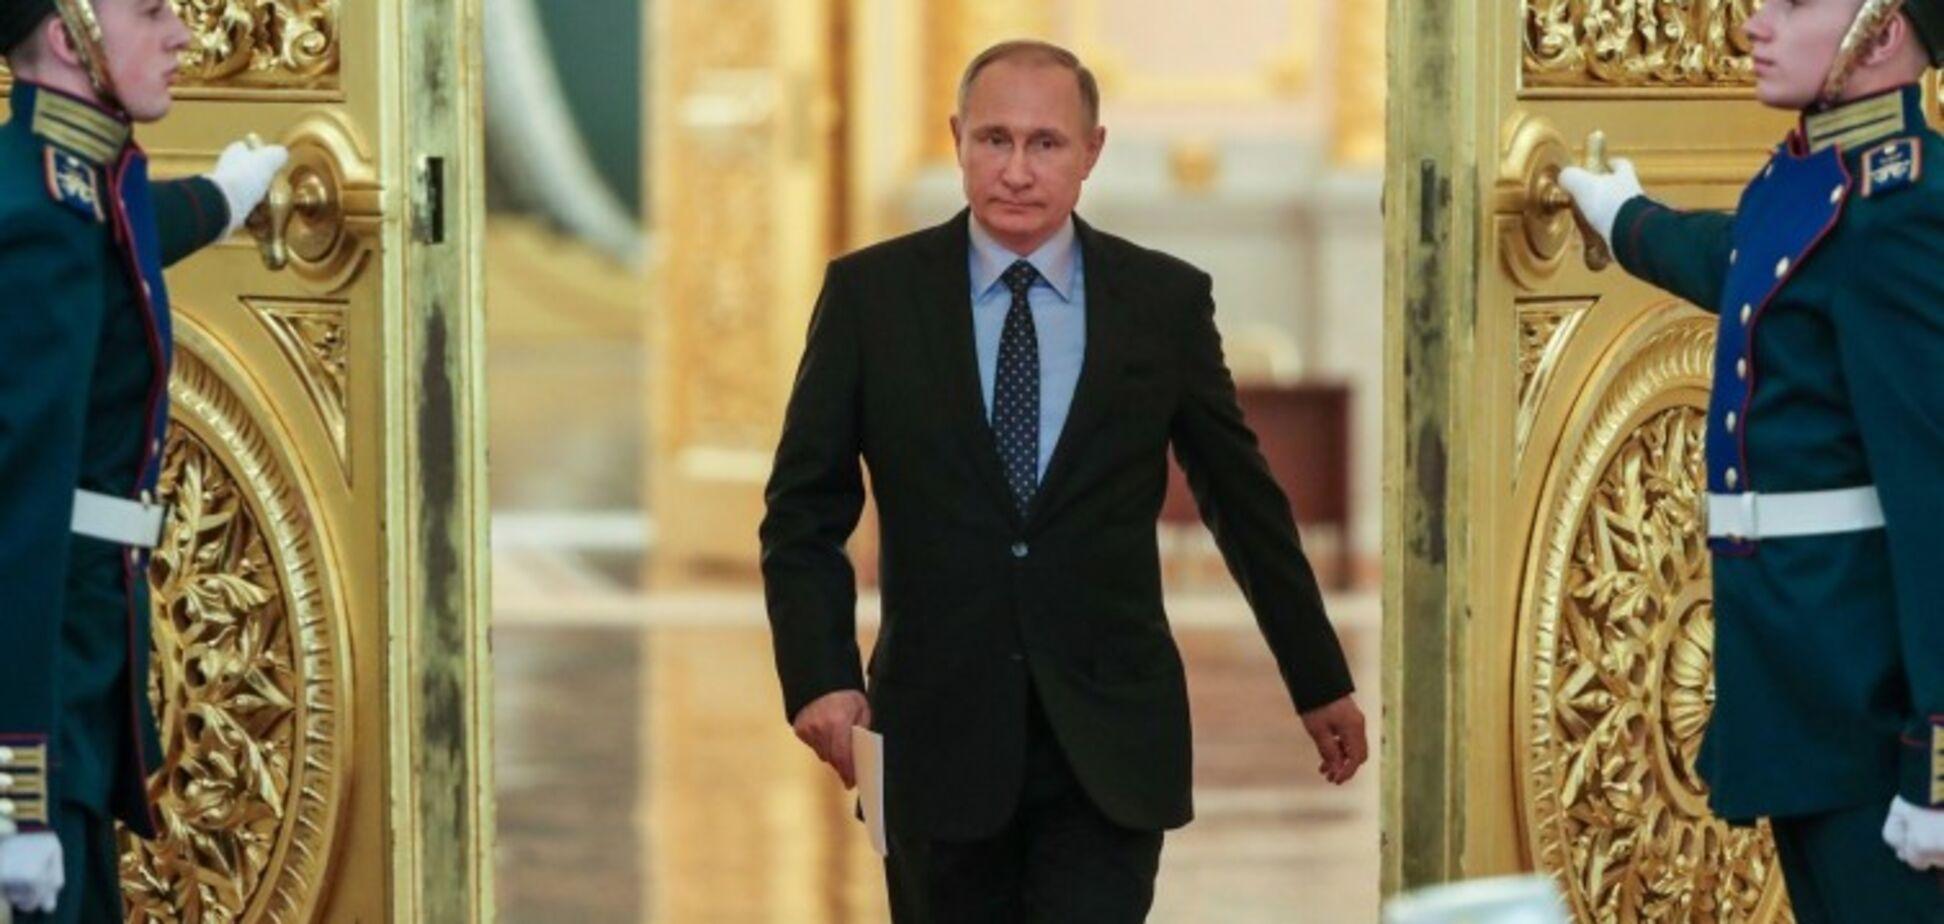 Голосовали за Путина и надеялись на реформы. Они дикари?